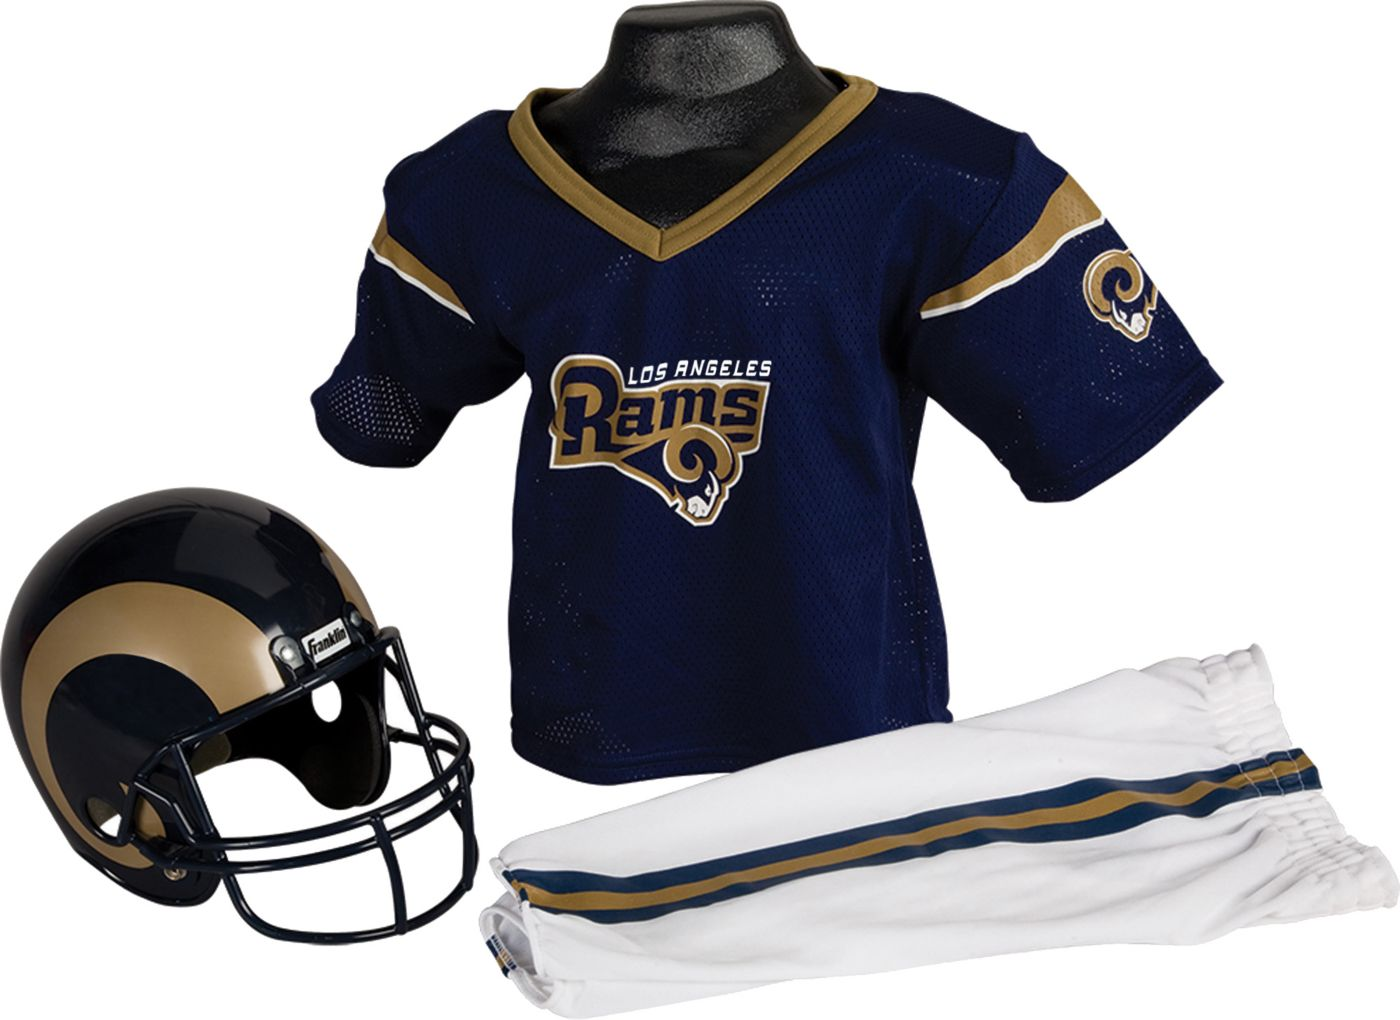 Franklin Los Angeles Rams Youth Deluxe Uniform Set